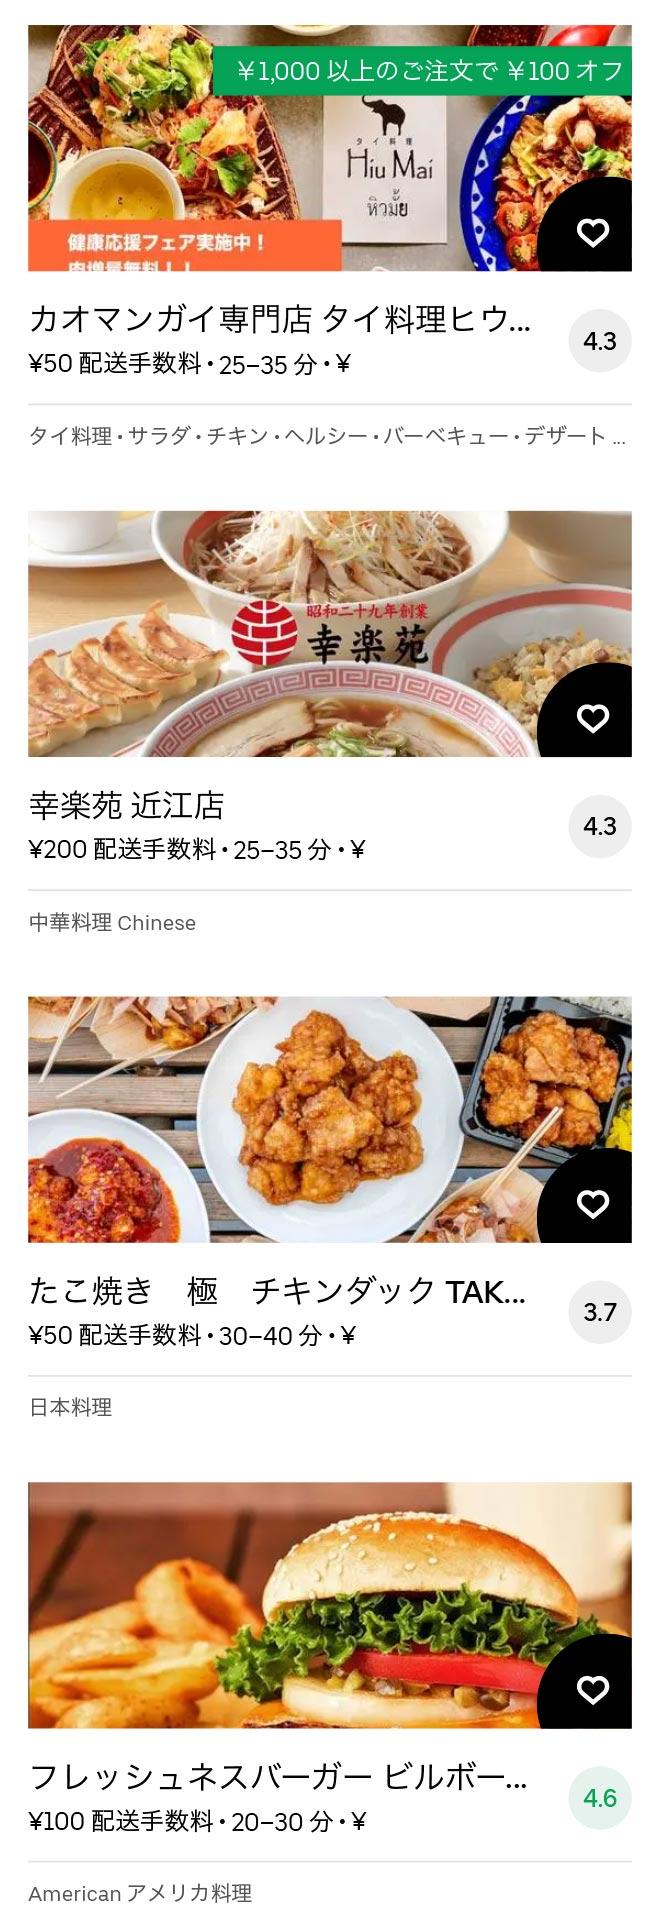 Niigata menu 2011 04